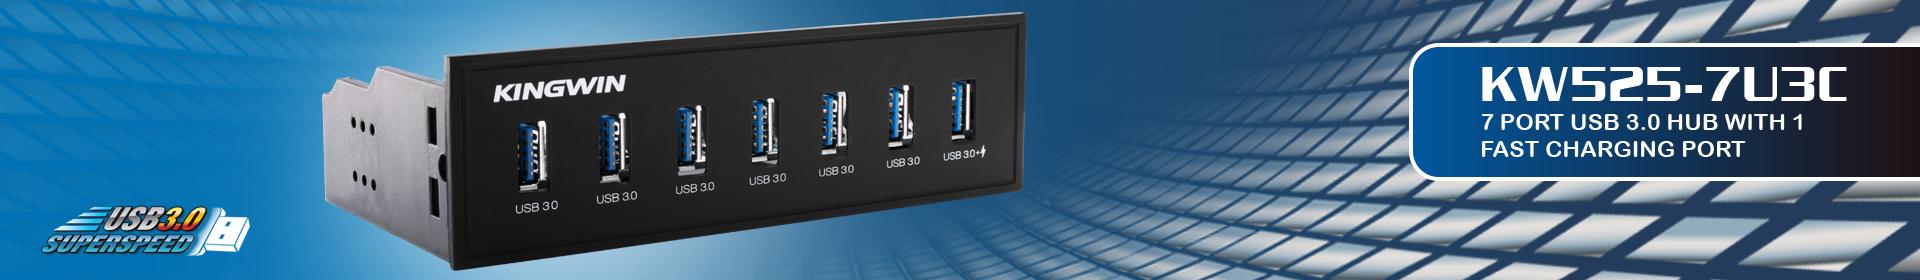 KW525-7U3C_Product_Header3